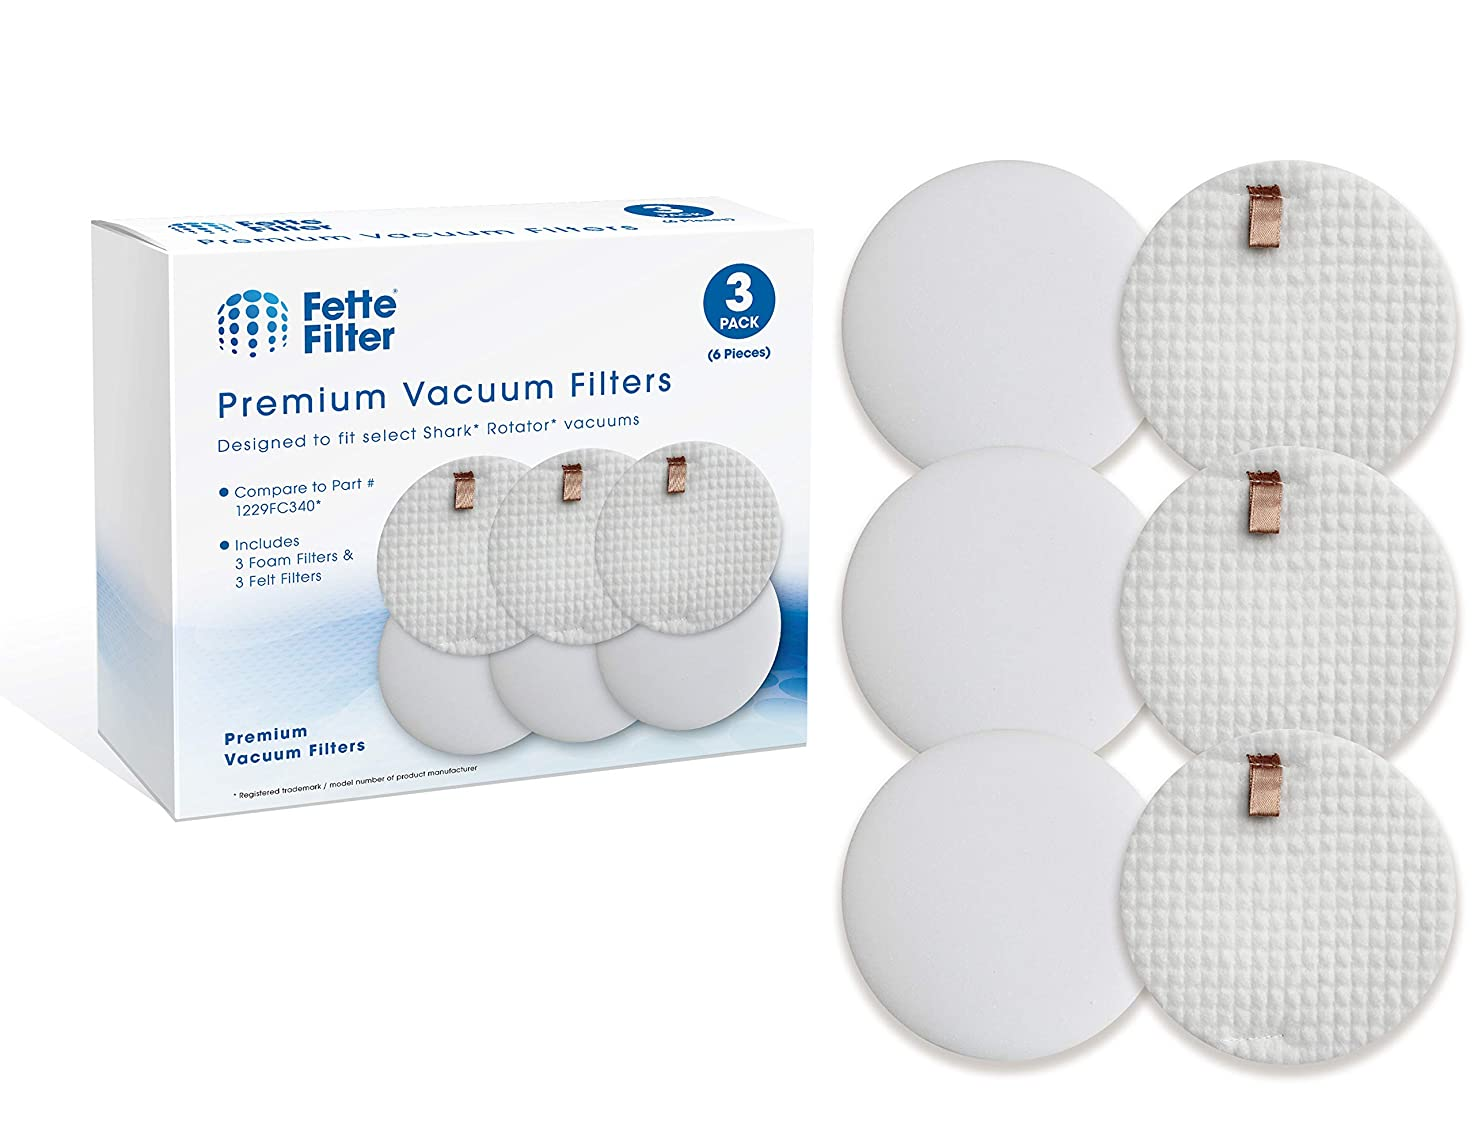 Fette Filter - Vacuum Filter Compatible with Shark Rotator Slim-Light Lift-Away NV341 & NV341Q. Compare to Part # 1229FC340 (3 Foam & 3 Felt Filters) noyddpyxdqlsl0